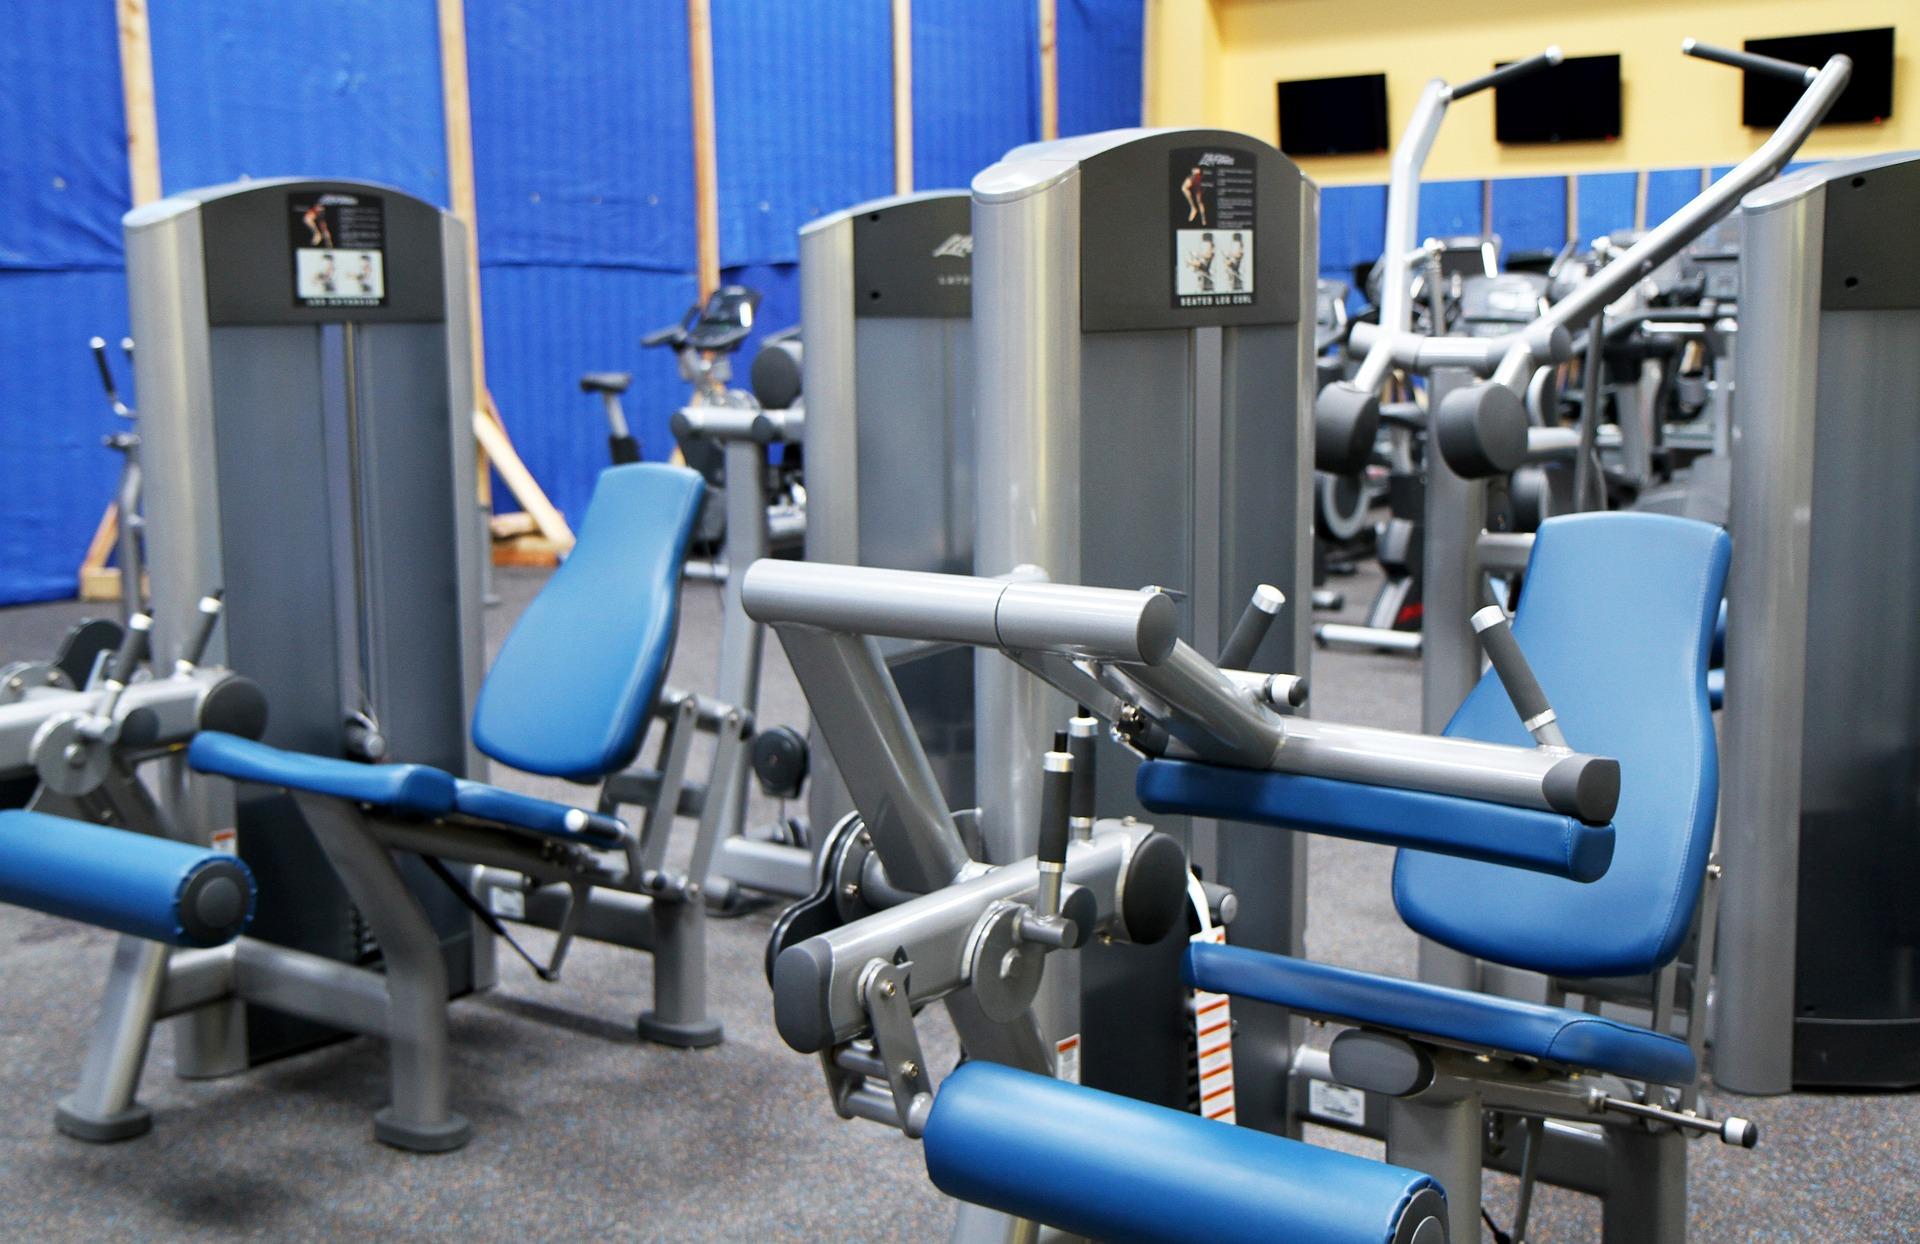 Resilier Salle De Sport Fitness Park Basic Fit Neoness Gigagym